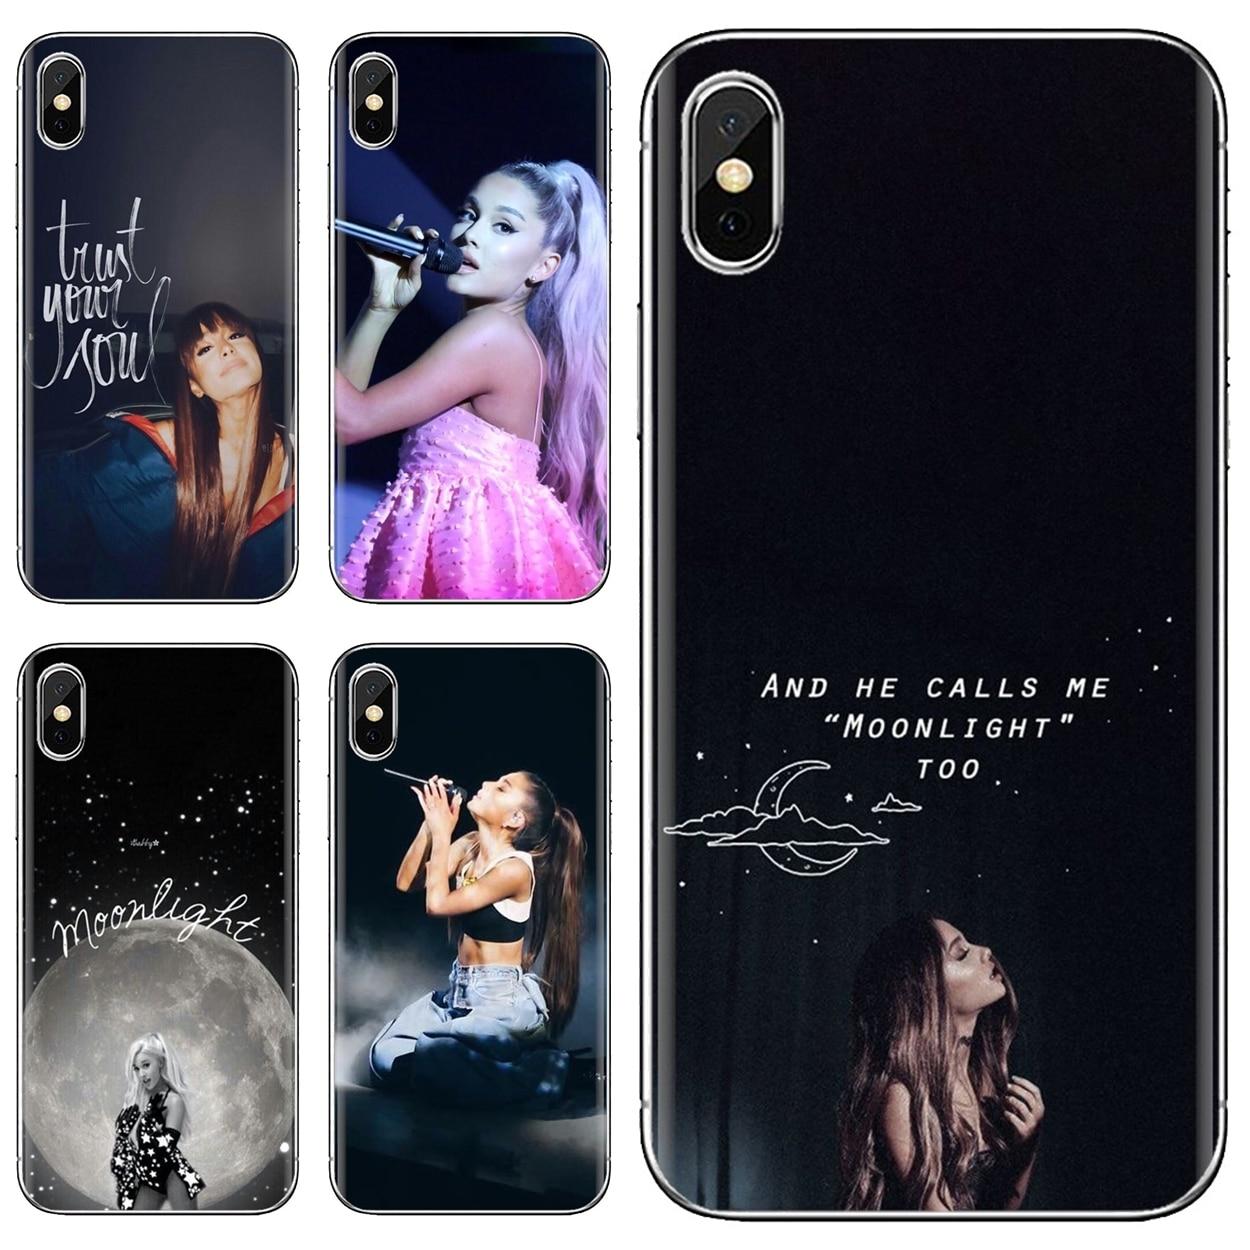 Caso suave arte belleza sexy cantante Ariana Grande para Samsung Galaxy A10 A40 A50 A70 A3 A5 A7 A9 A8 A6 Plus 2018, 2015, 2016, 2017